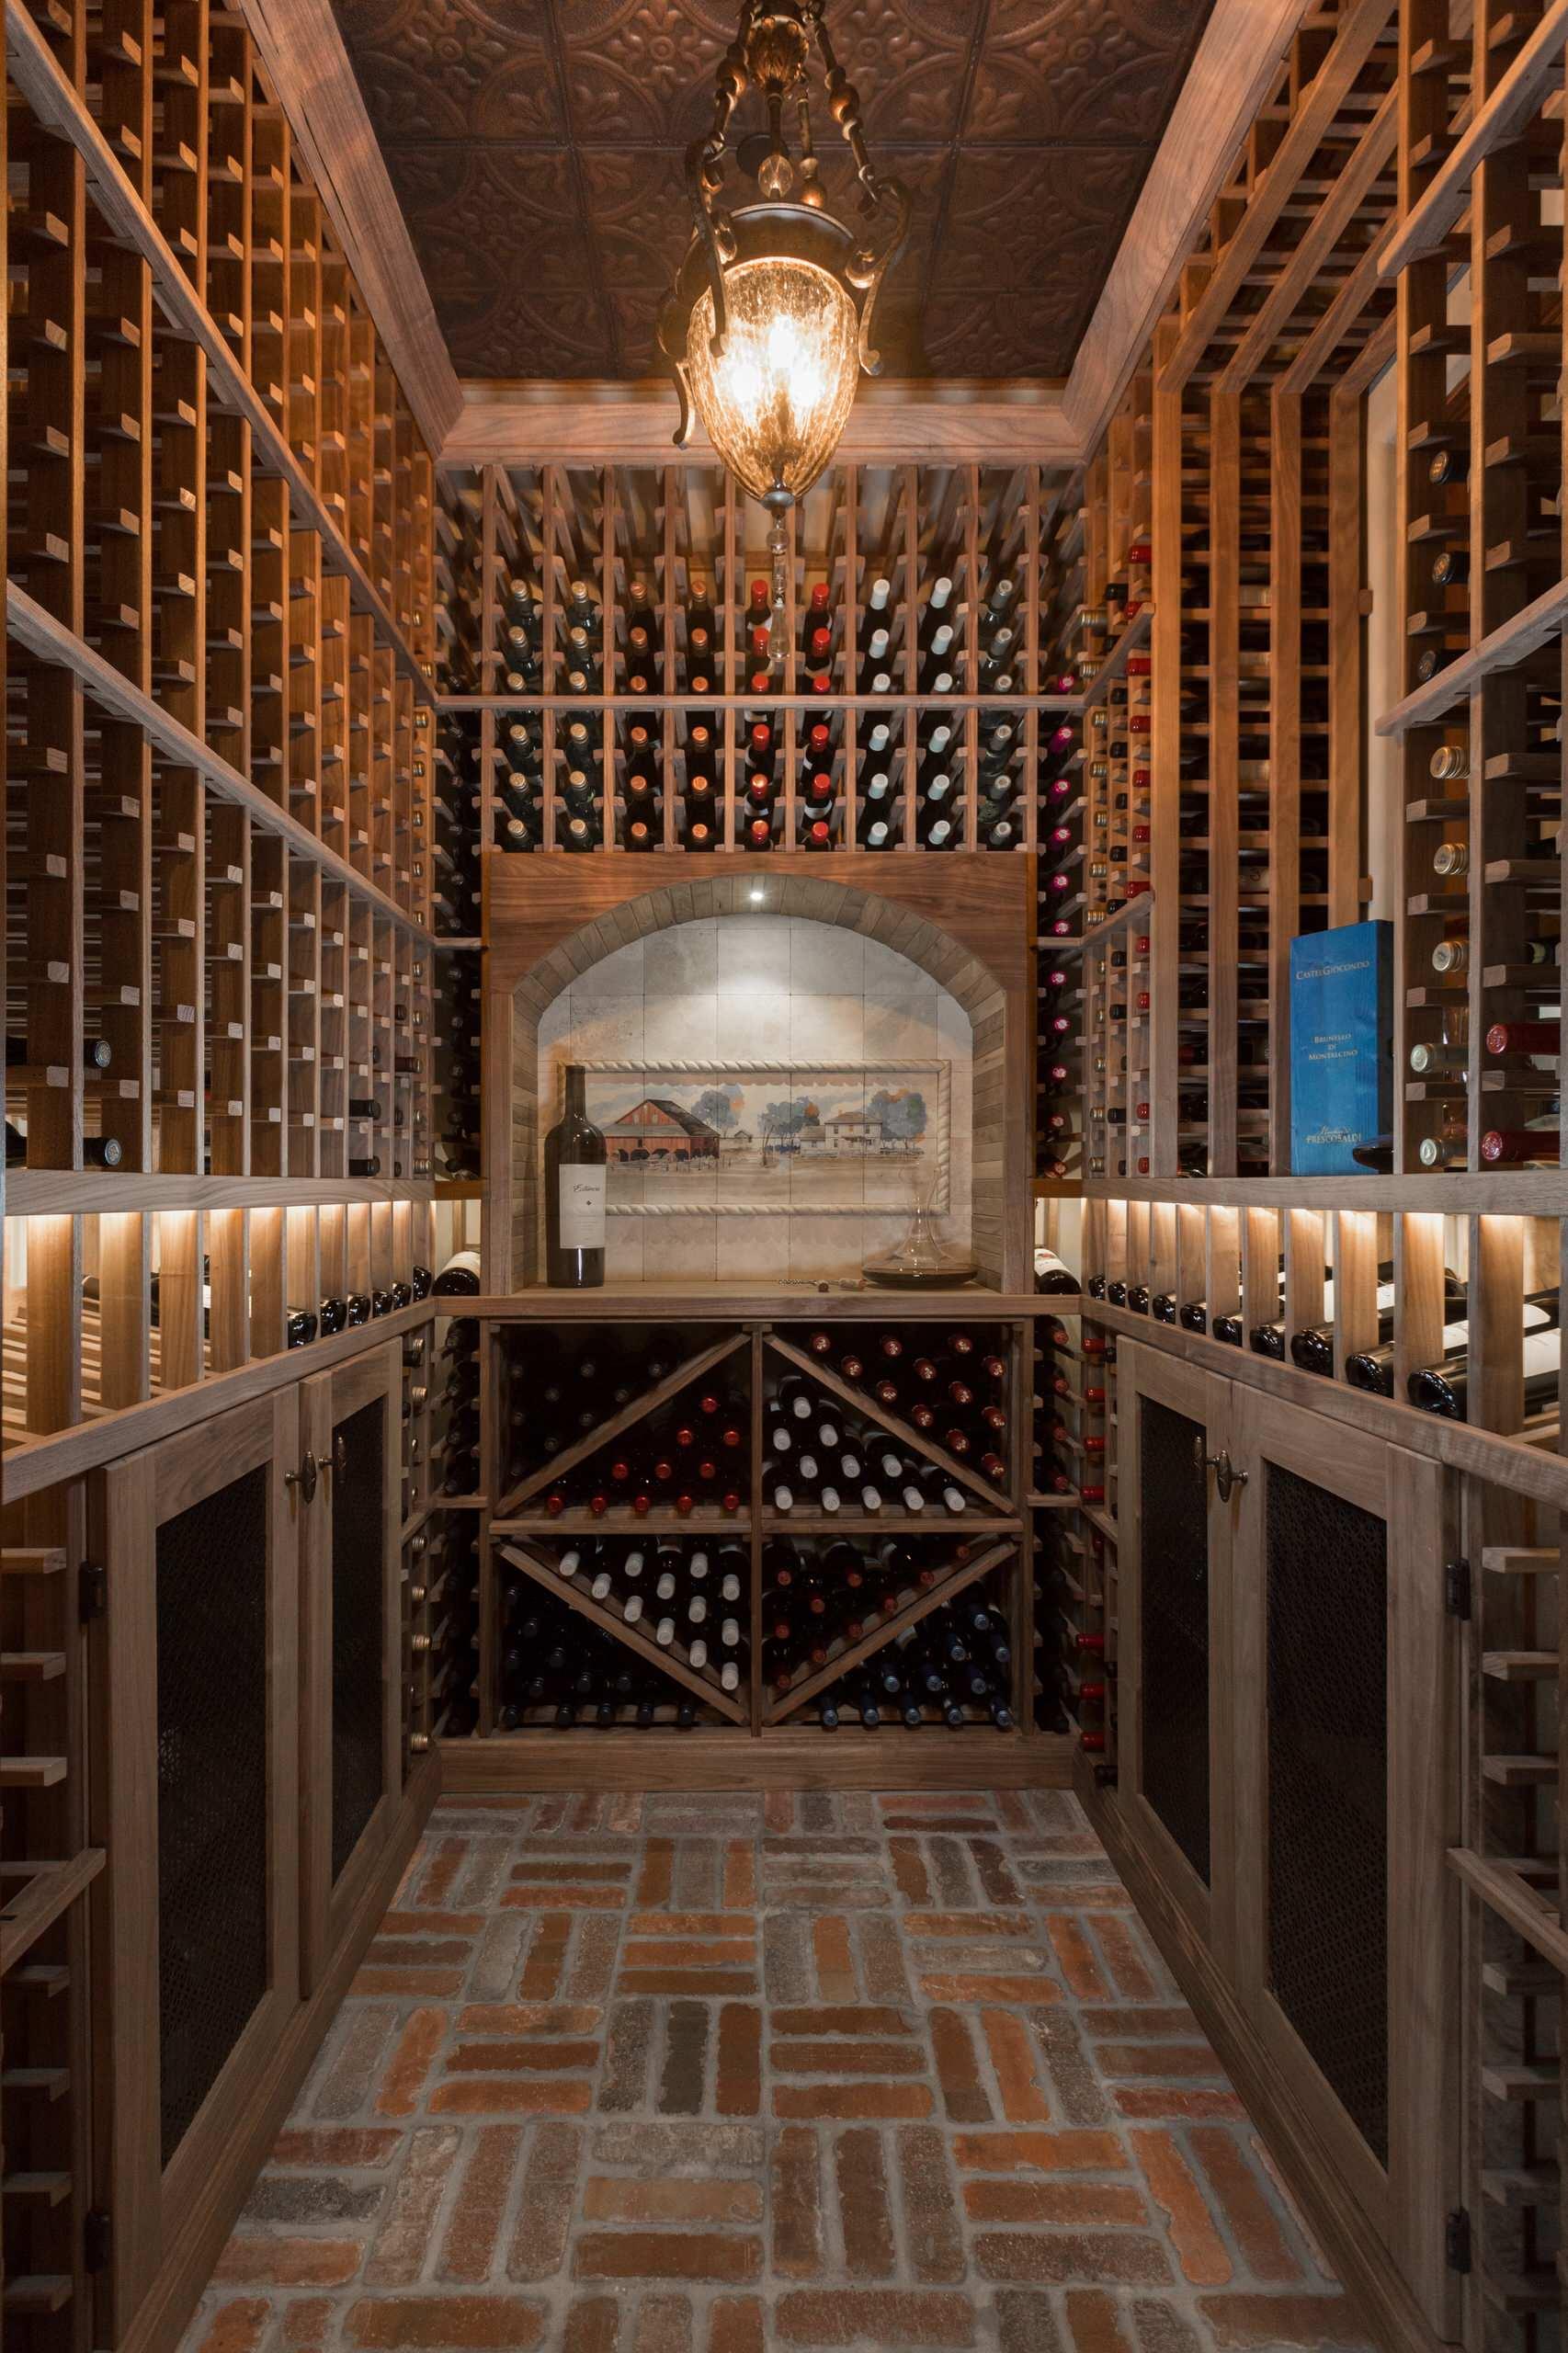 75 Beautiful Brick Floor Wine Cellar Pictures Ideas January 2021 Houzz